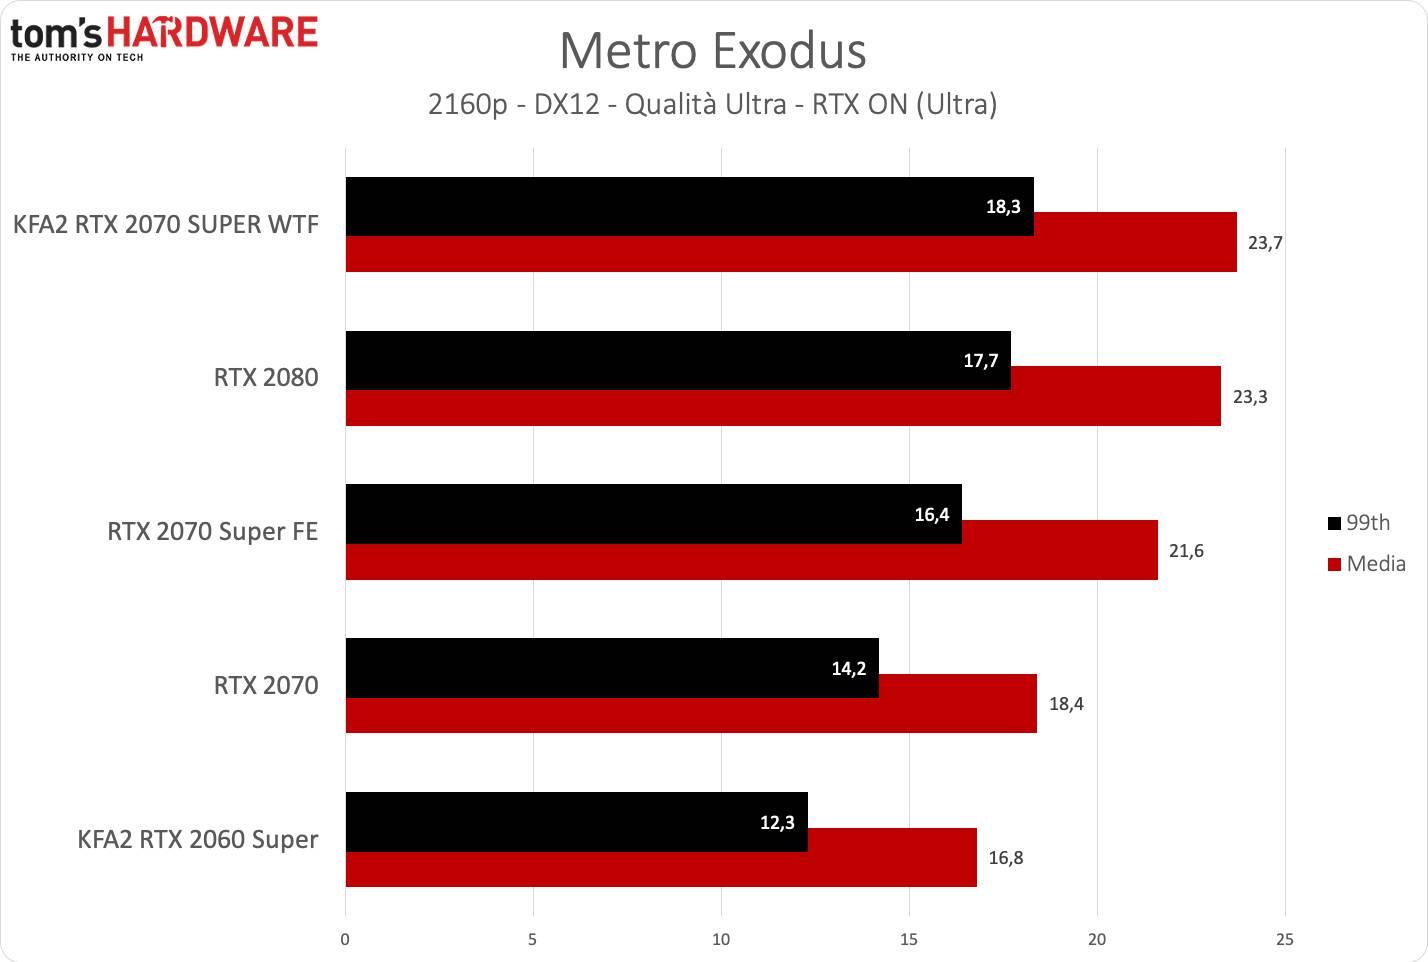 KFA2 RTX 2070 SUPER WTF - Metro UHD RTX